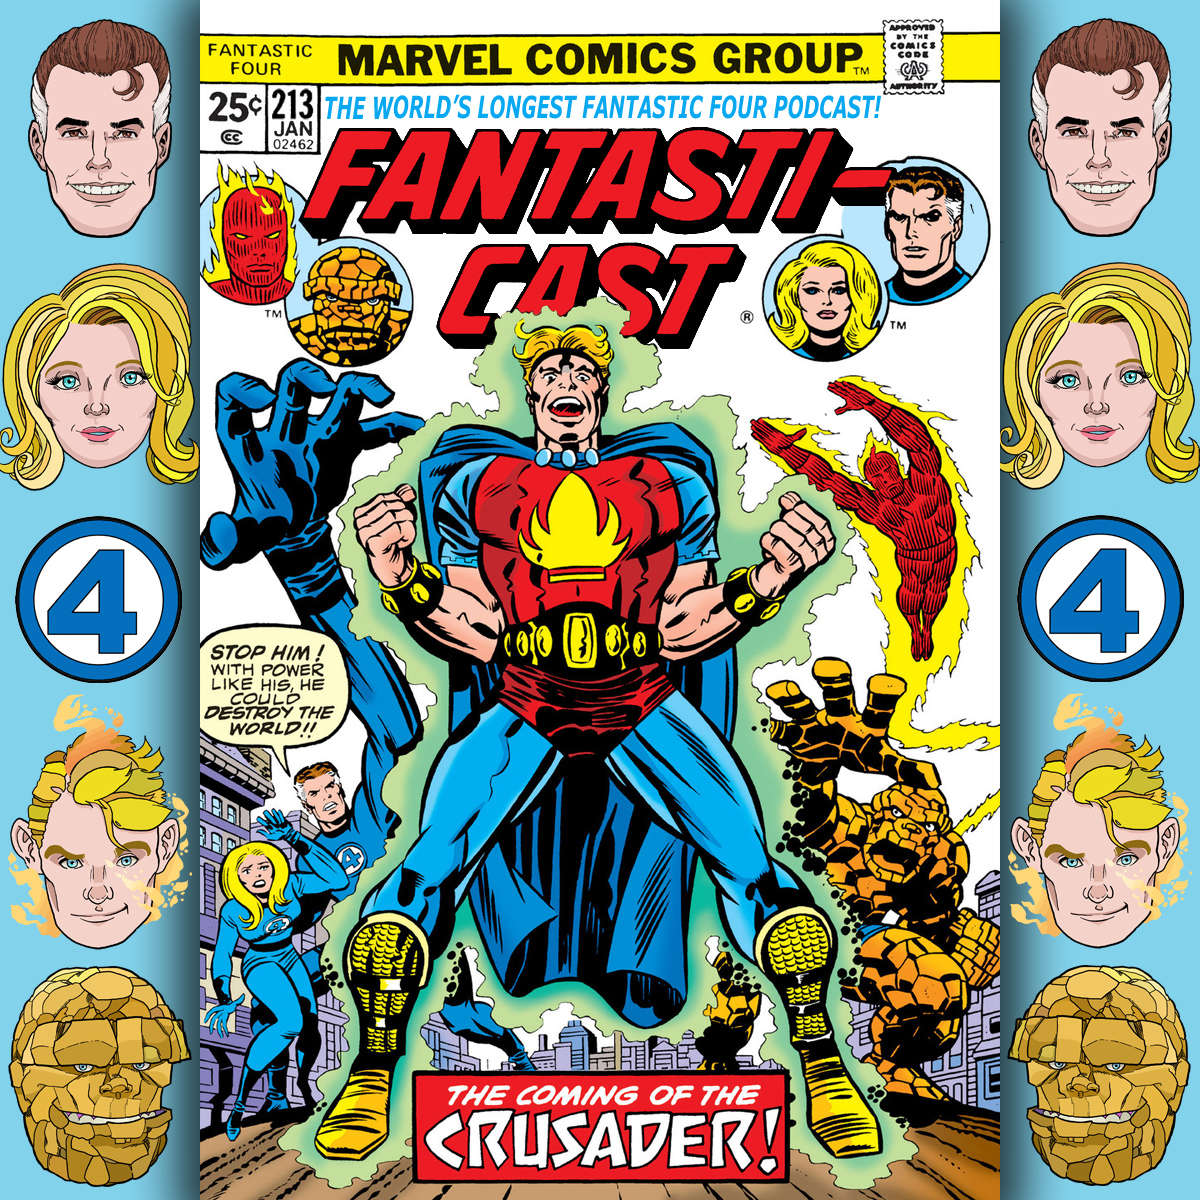 Episode 213: Fantastic Four #163 - The Crusader Syndrome